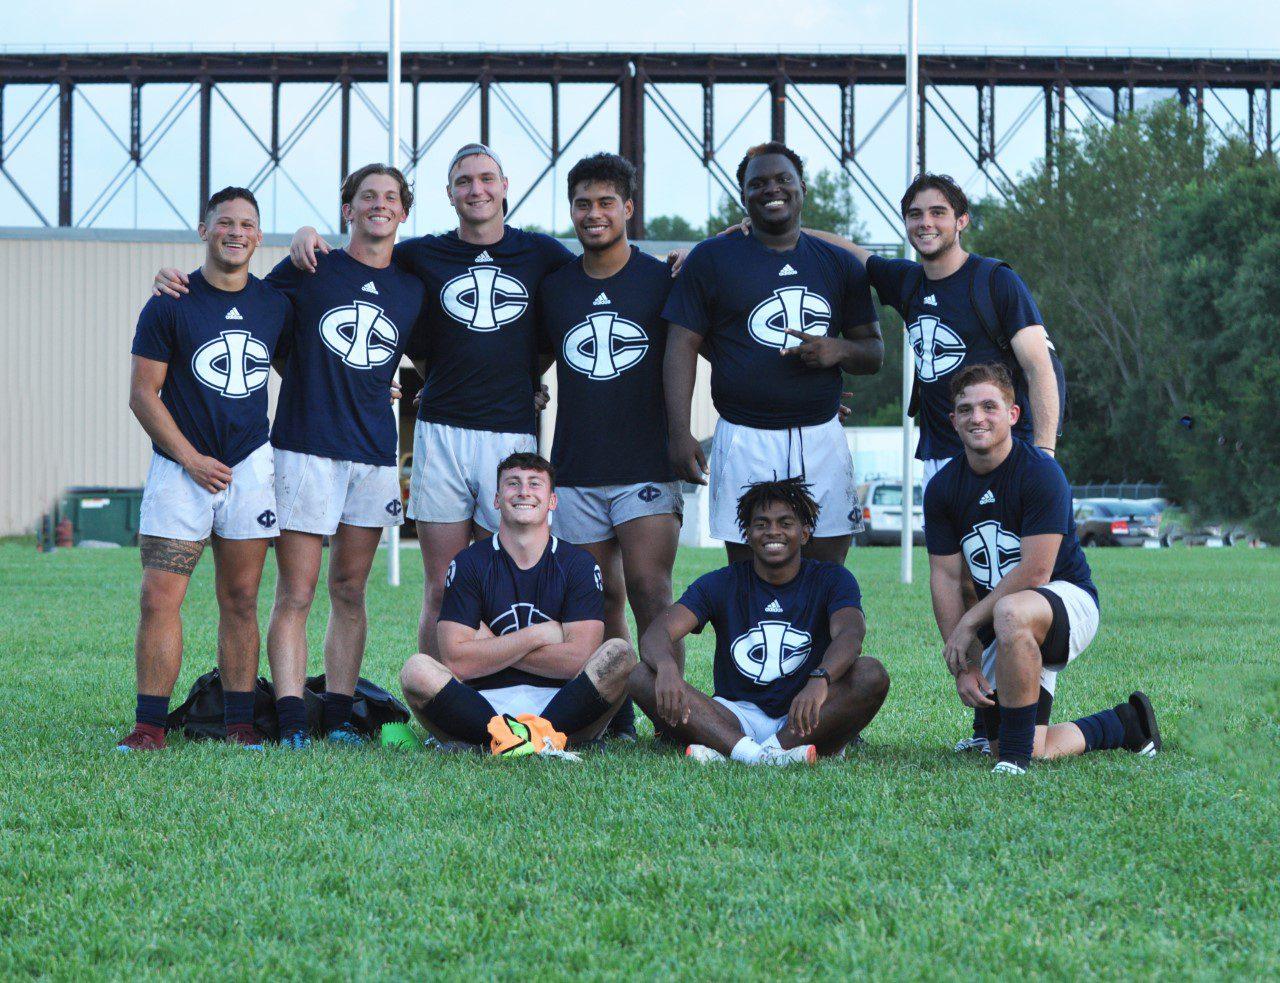 Rugby-1280x983.jpg